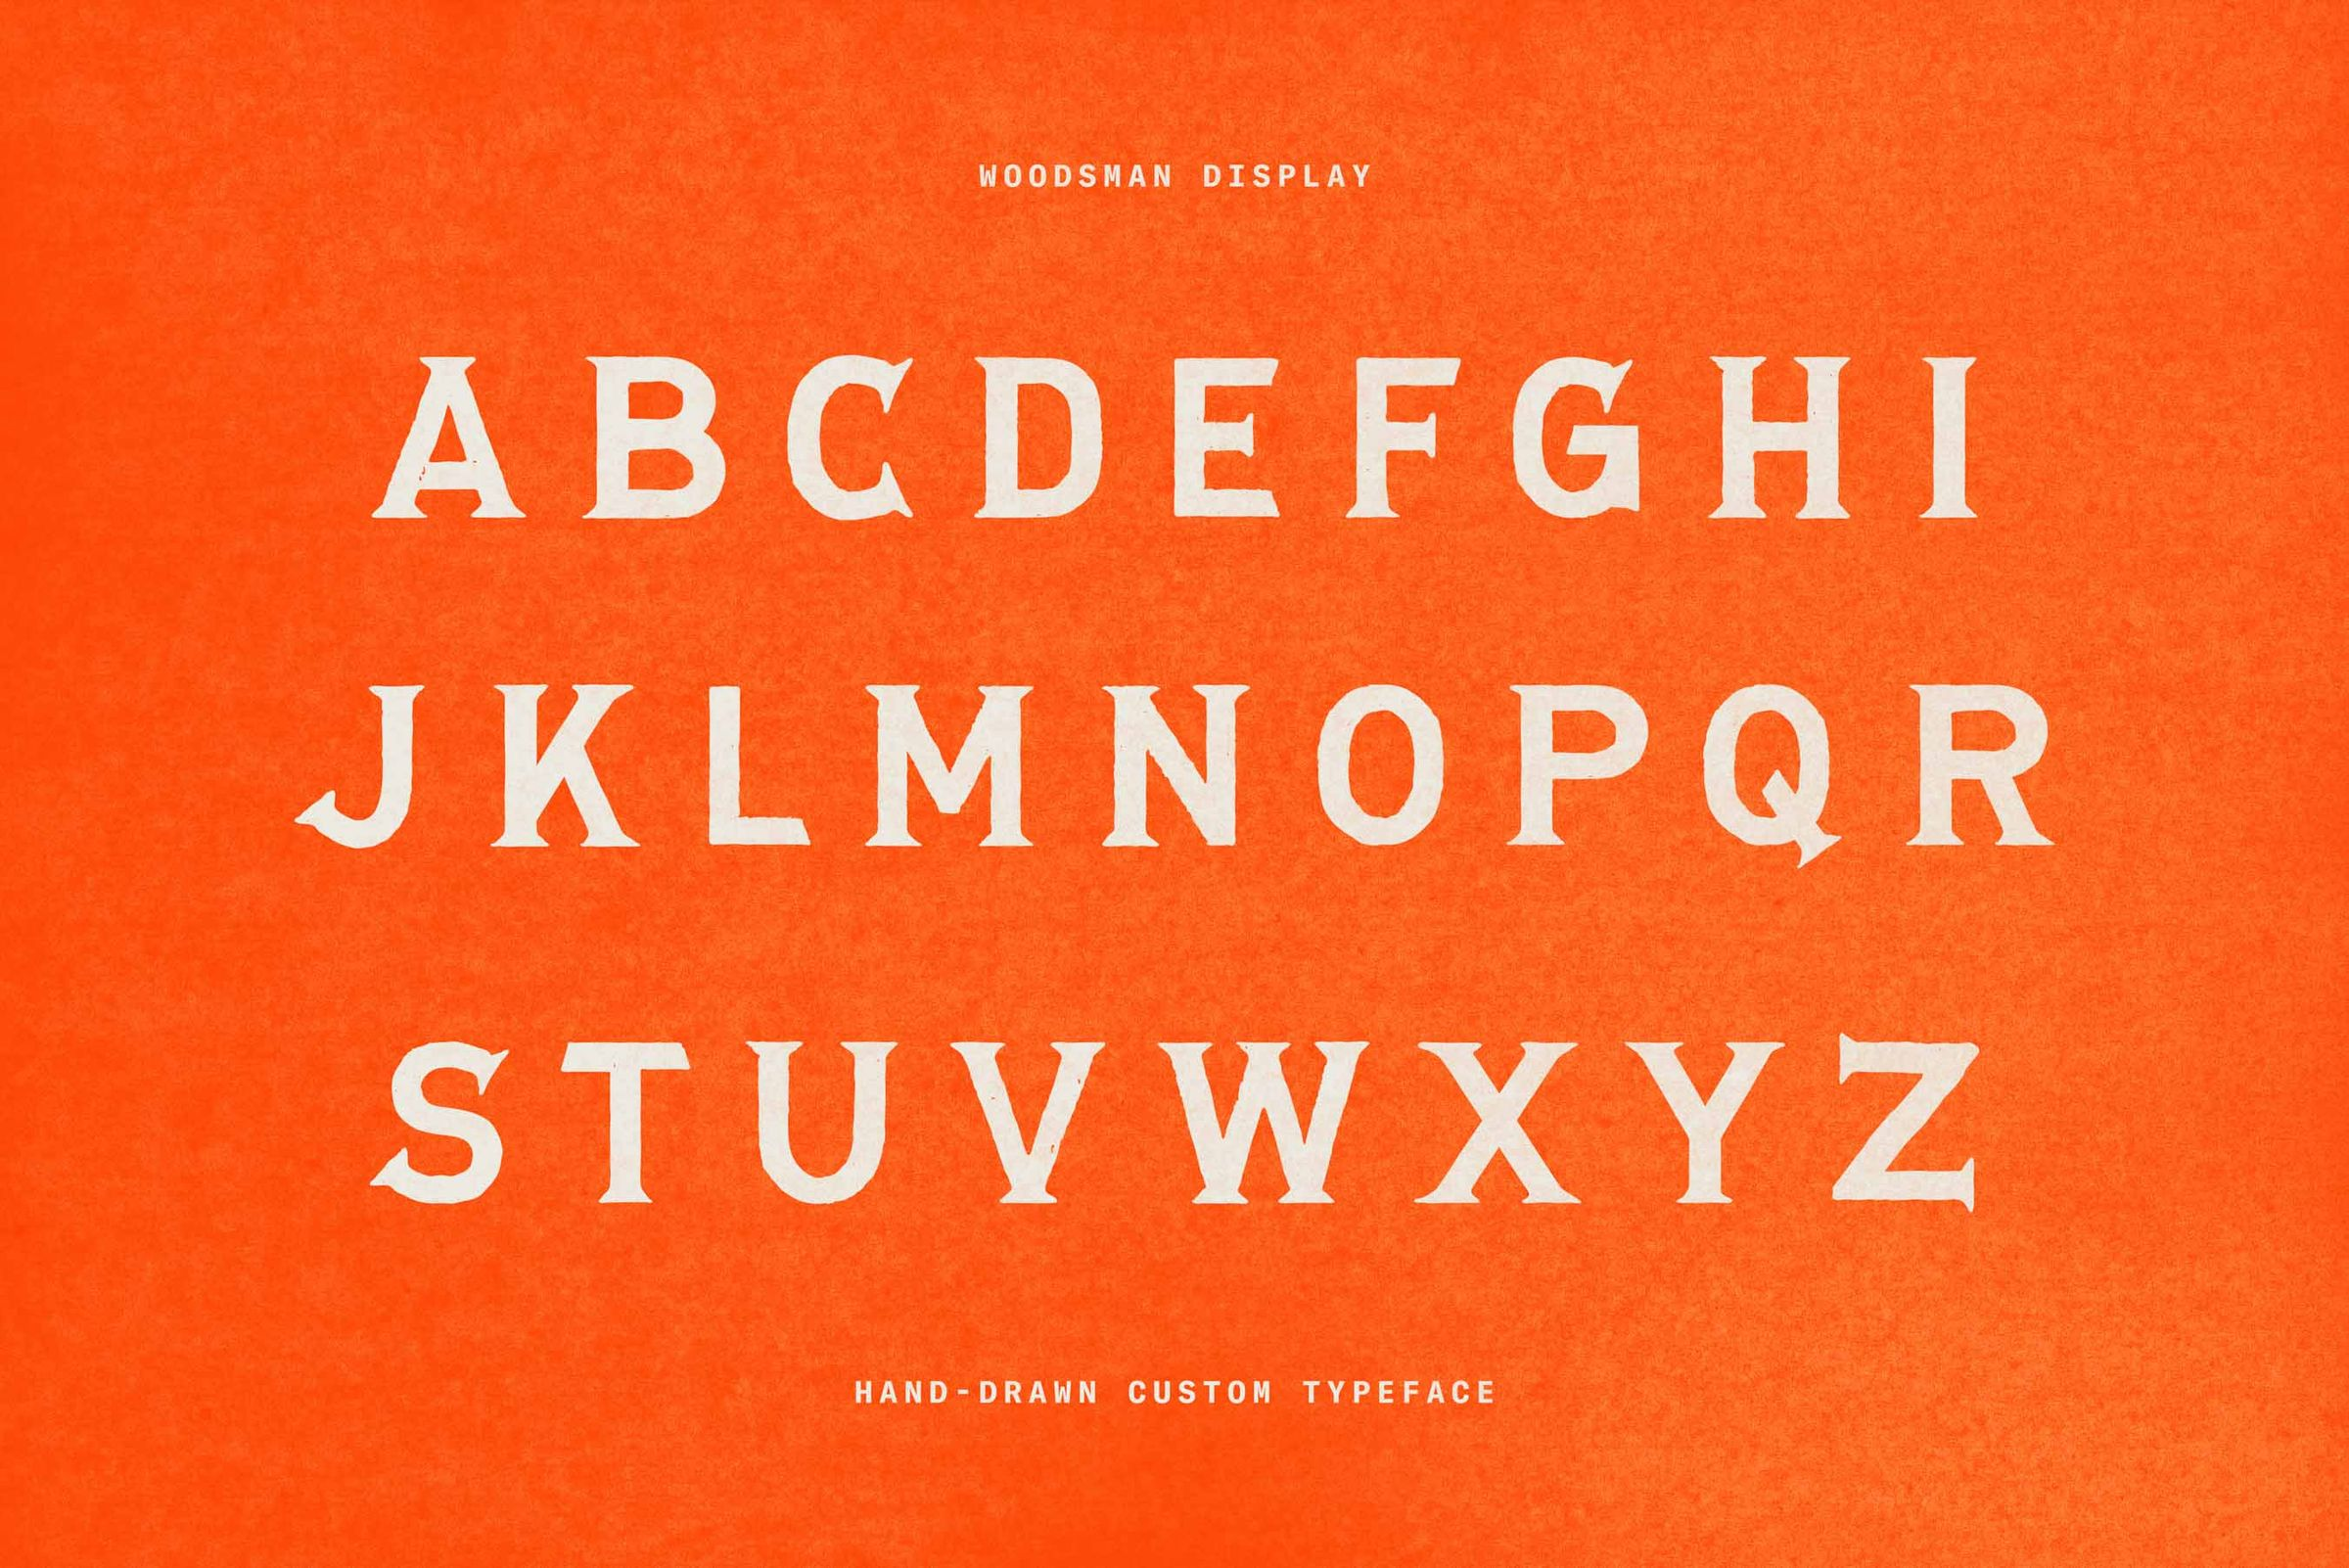 Woodsman Display hand drawn typeface